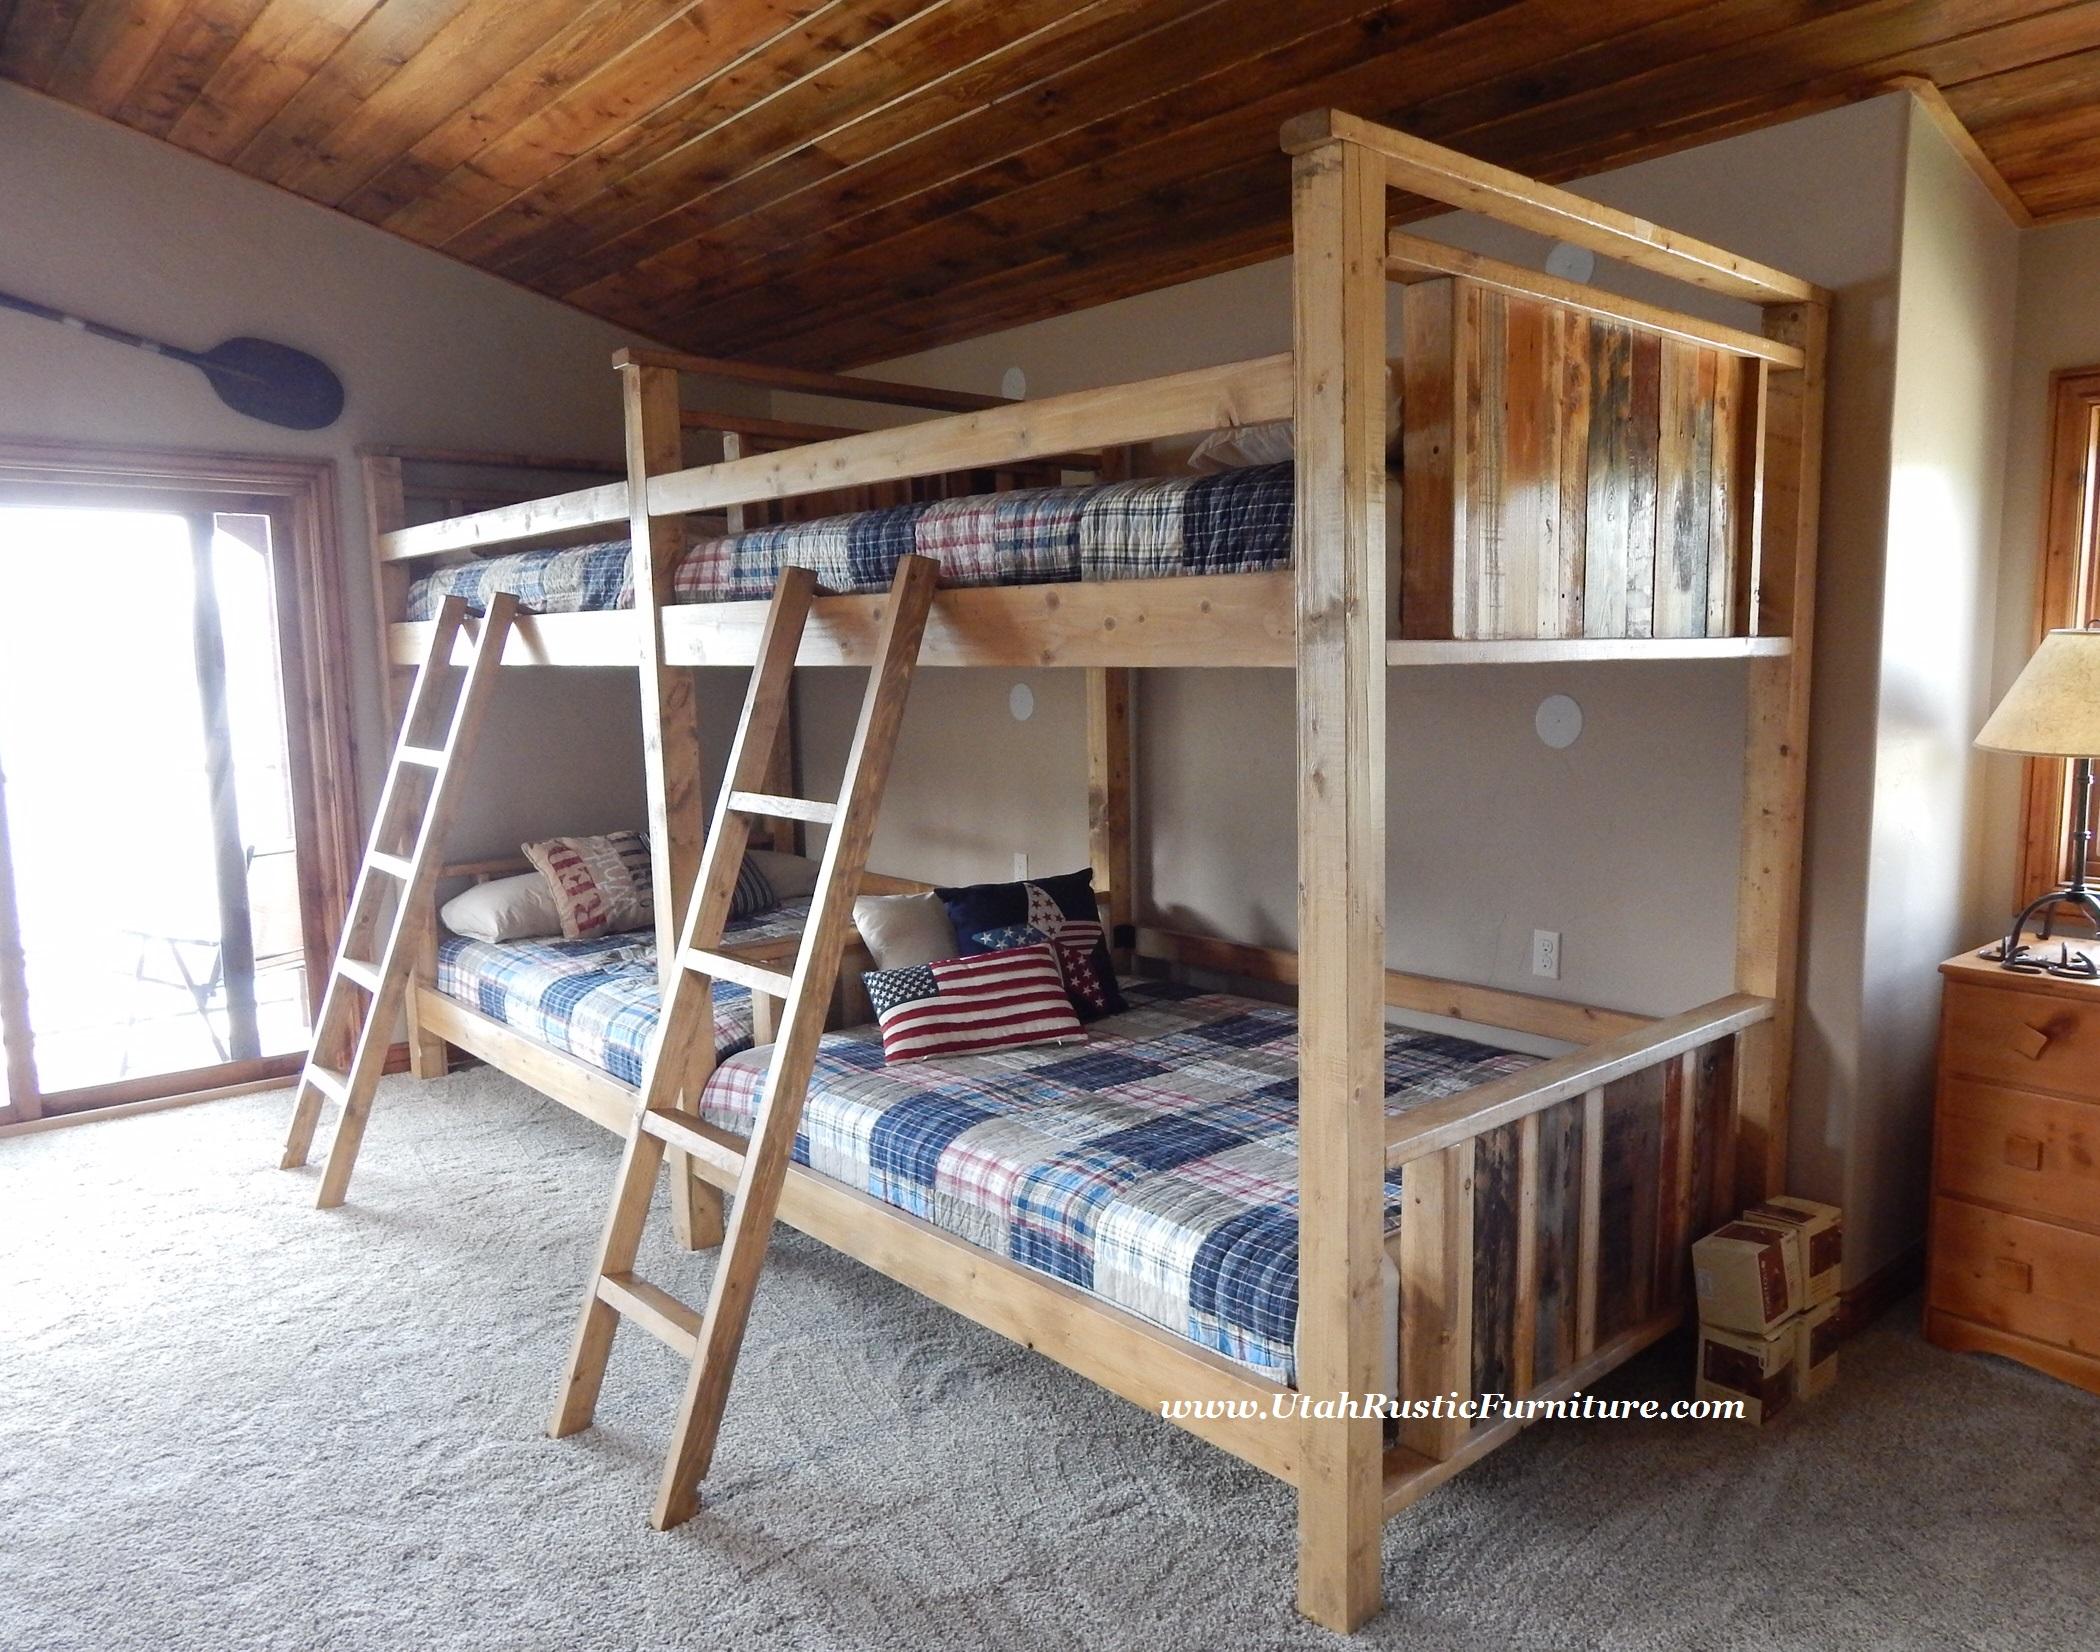 bradley's furniture etc. - rustic log and barnwood bunk beds